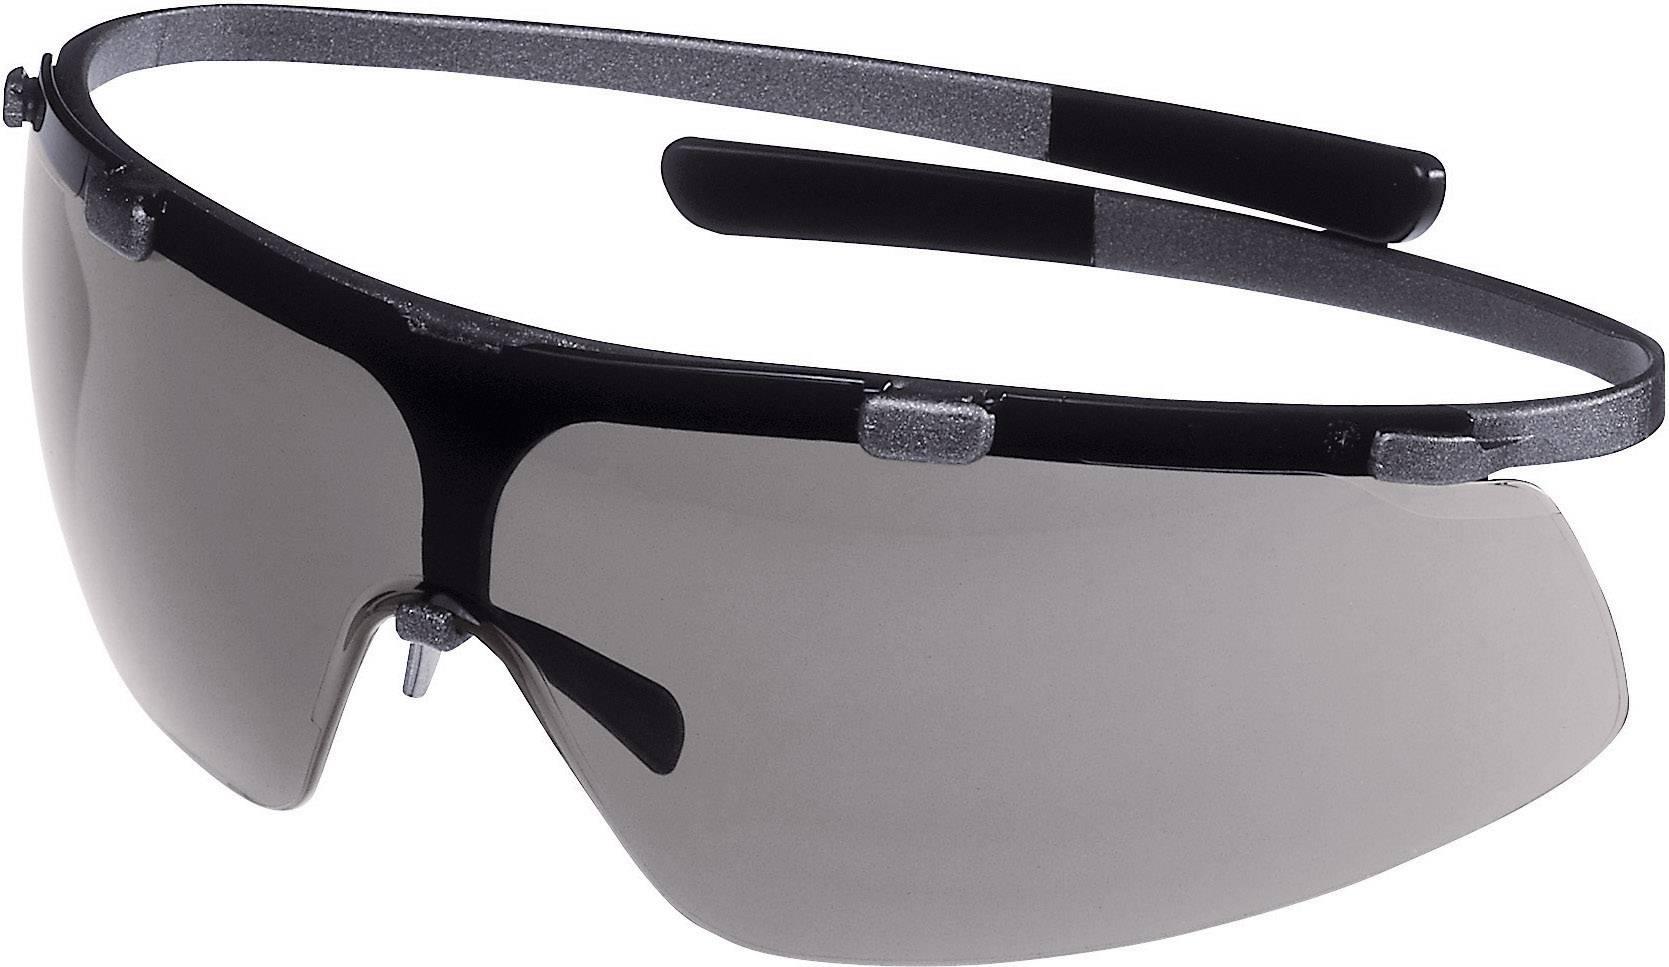 Ochranné brýle Uvex SuperG, 9172 086, transparentní